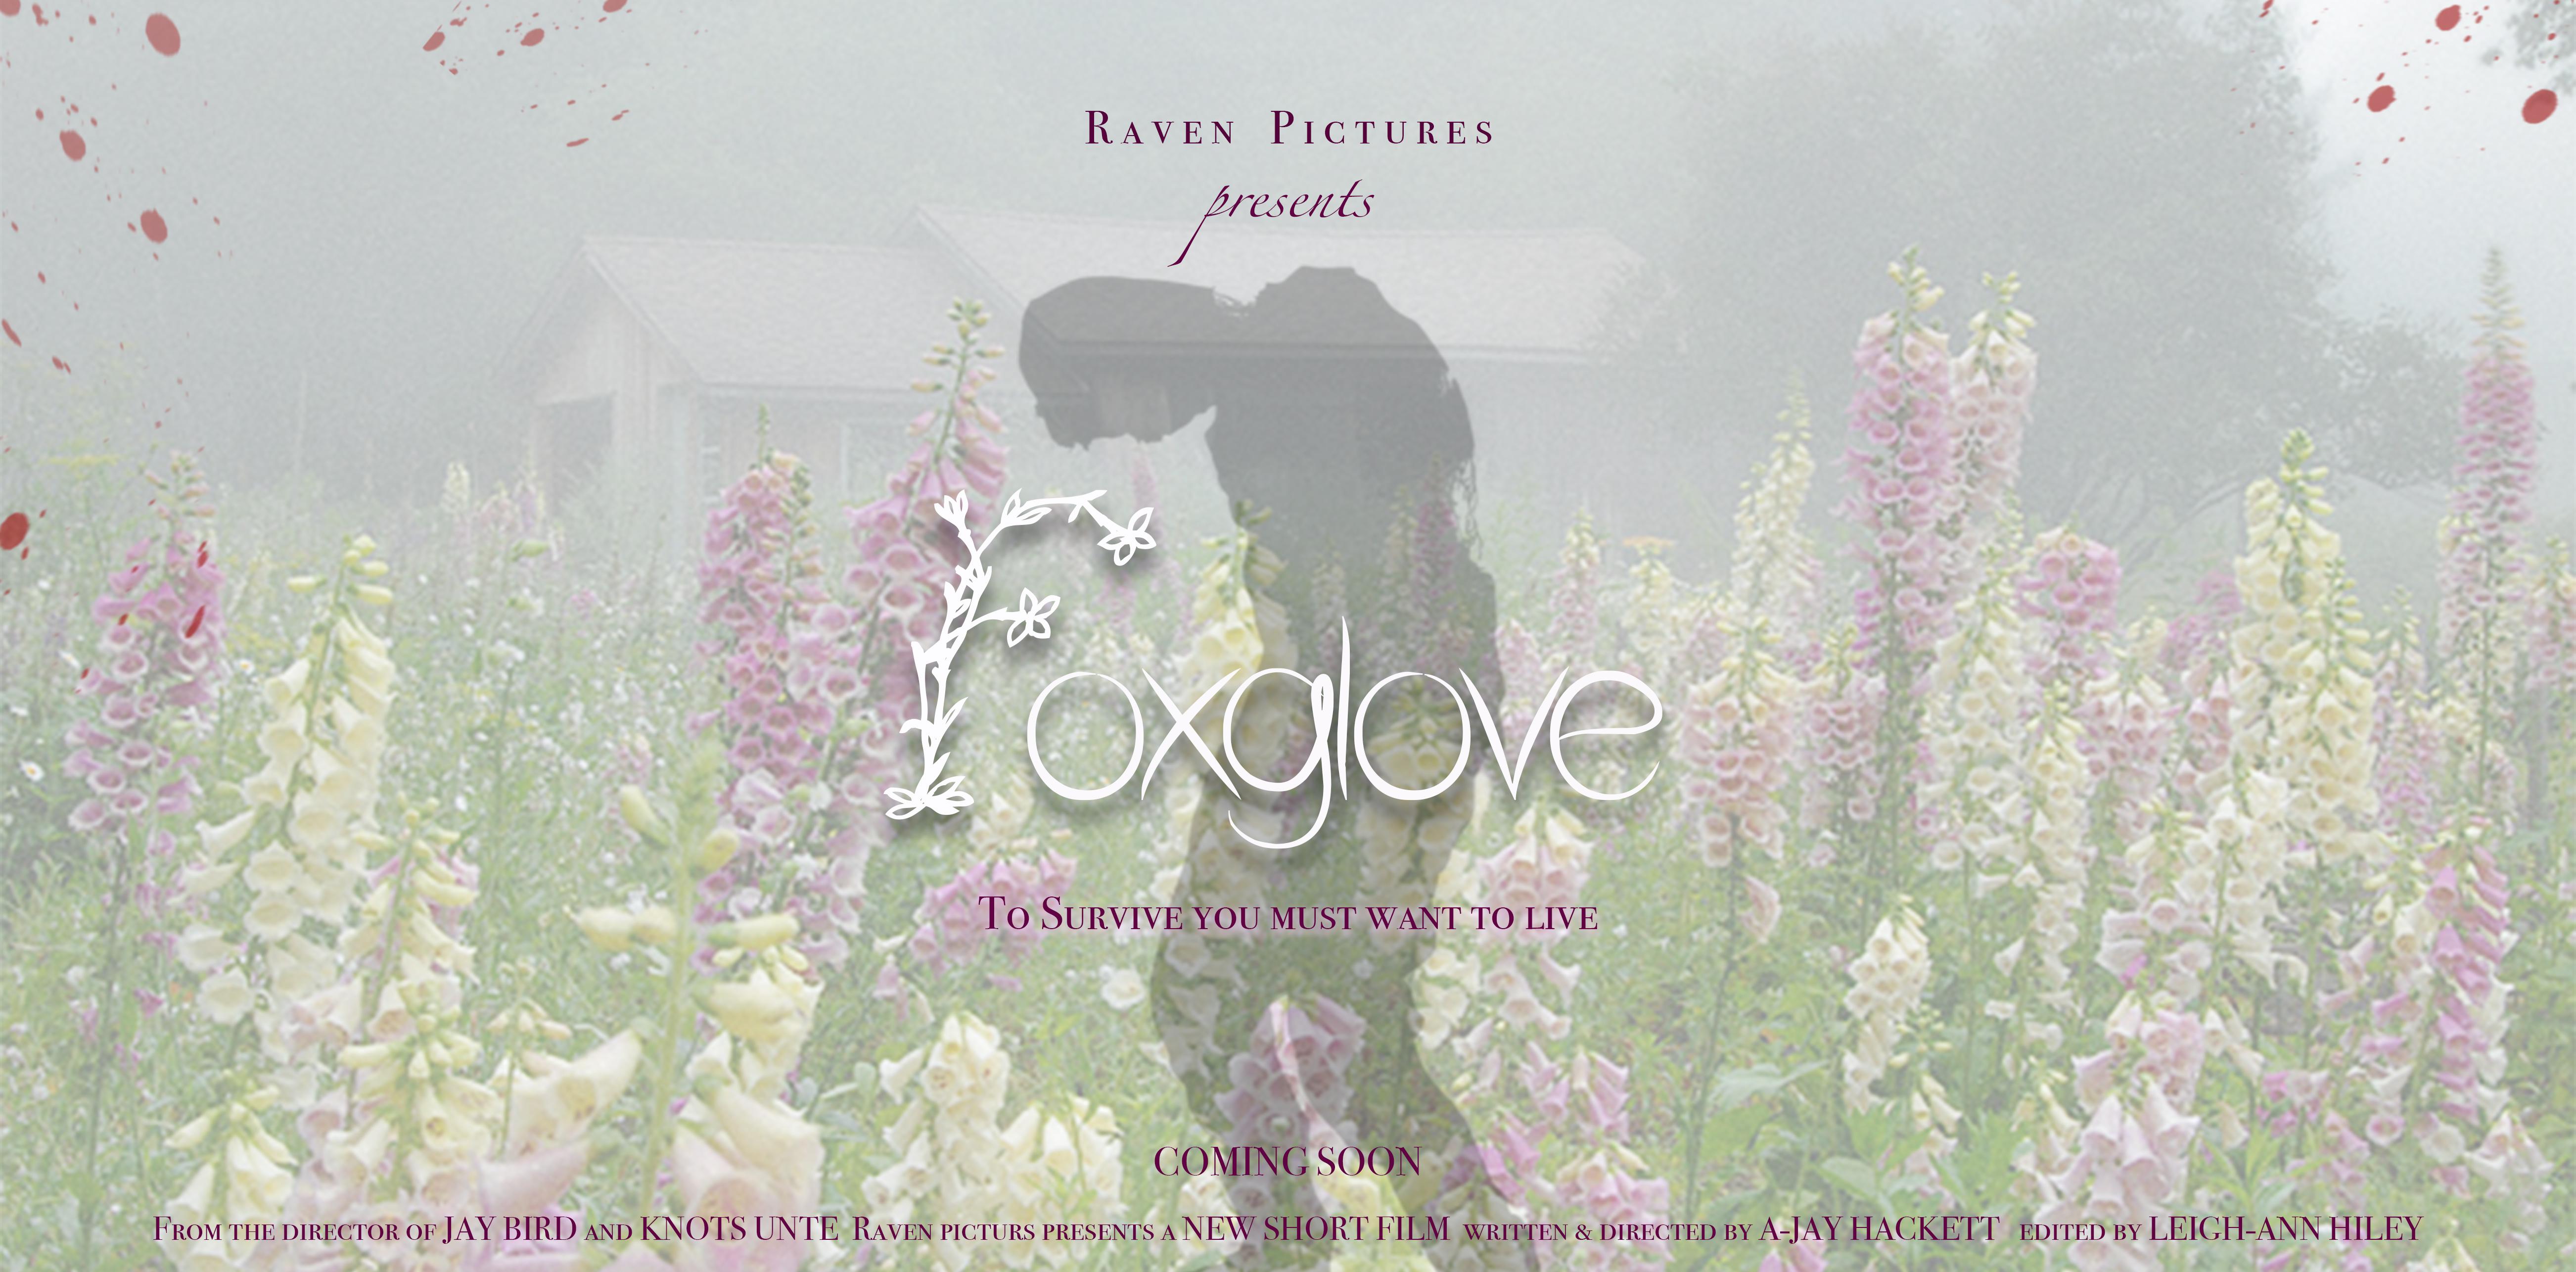 foxgolove poster 2